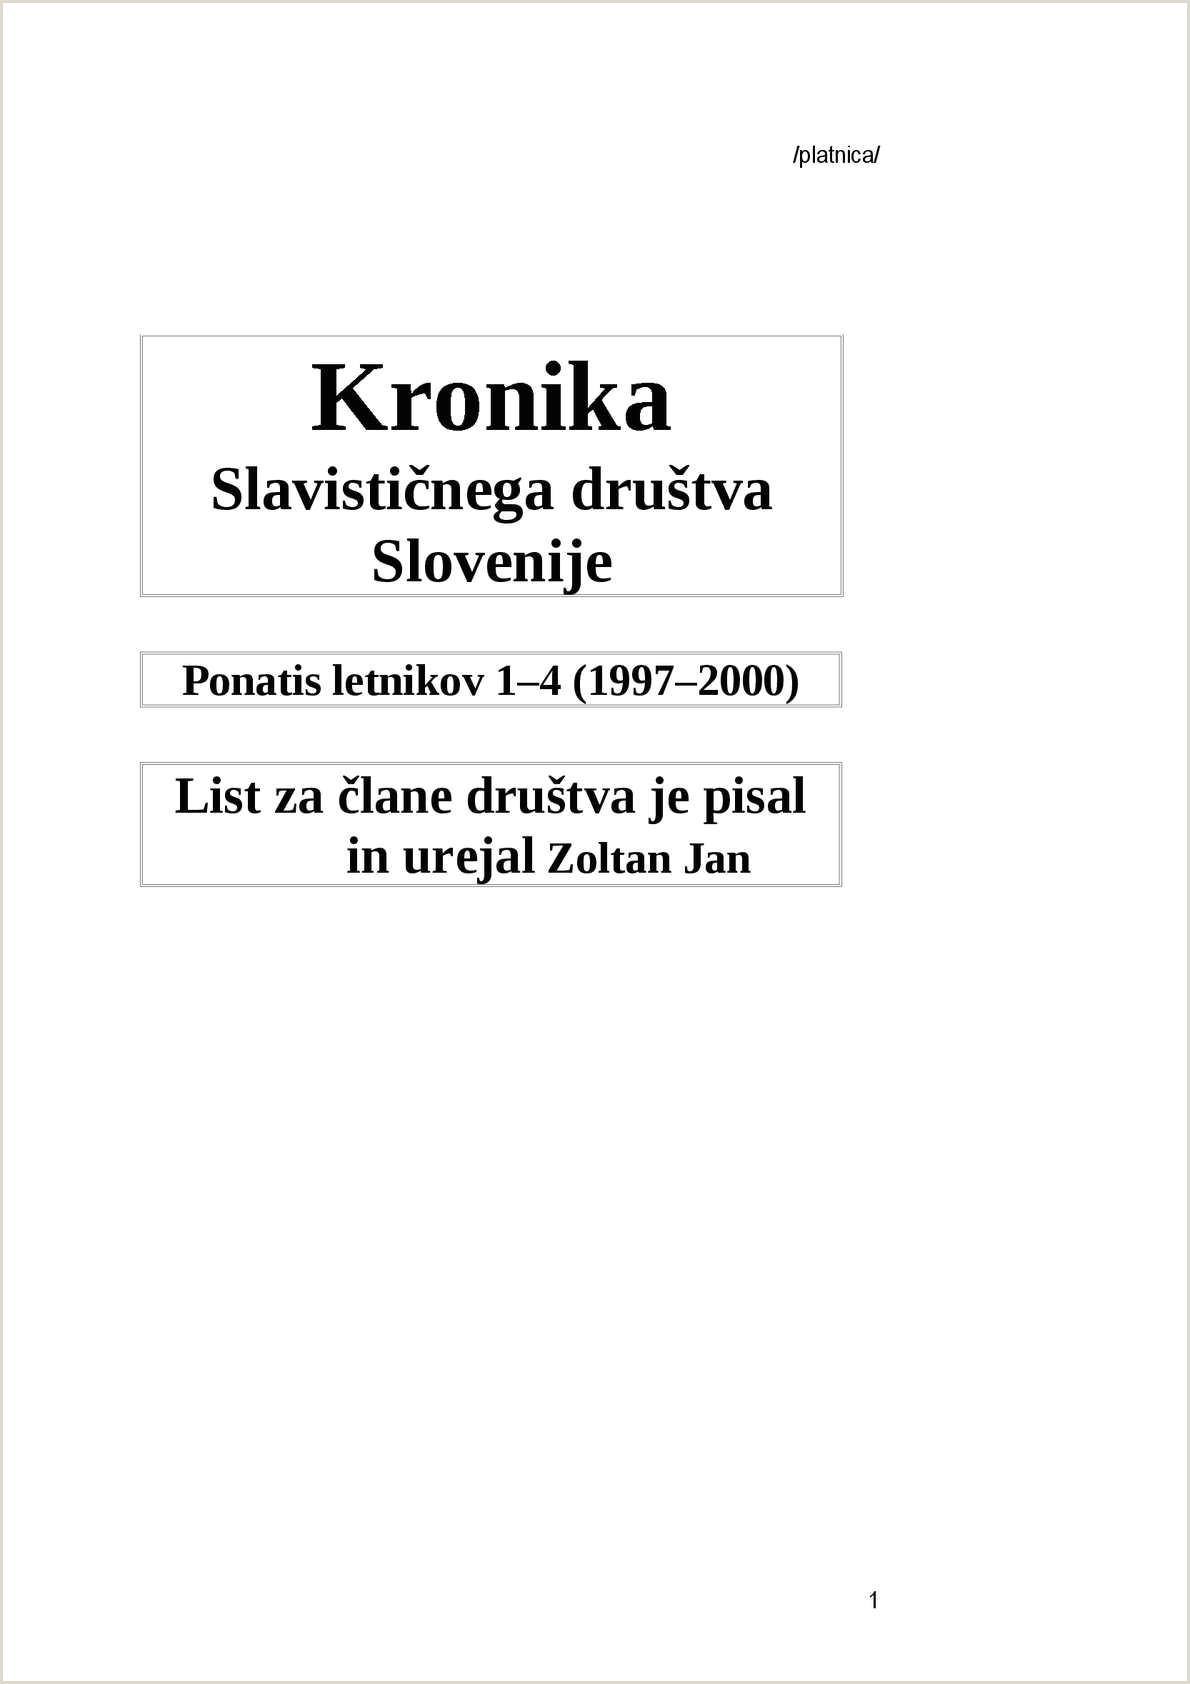 Hoja De Vida Curriculum Vitae Minerva 10-00 Calaméo Kronika Sds 01 23 1997 2000